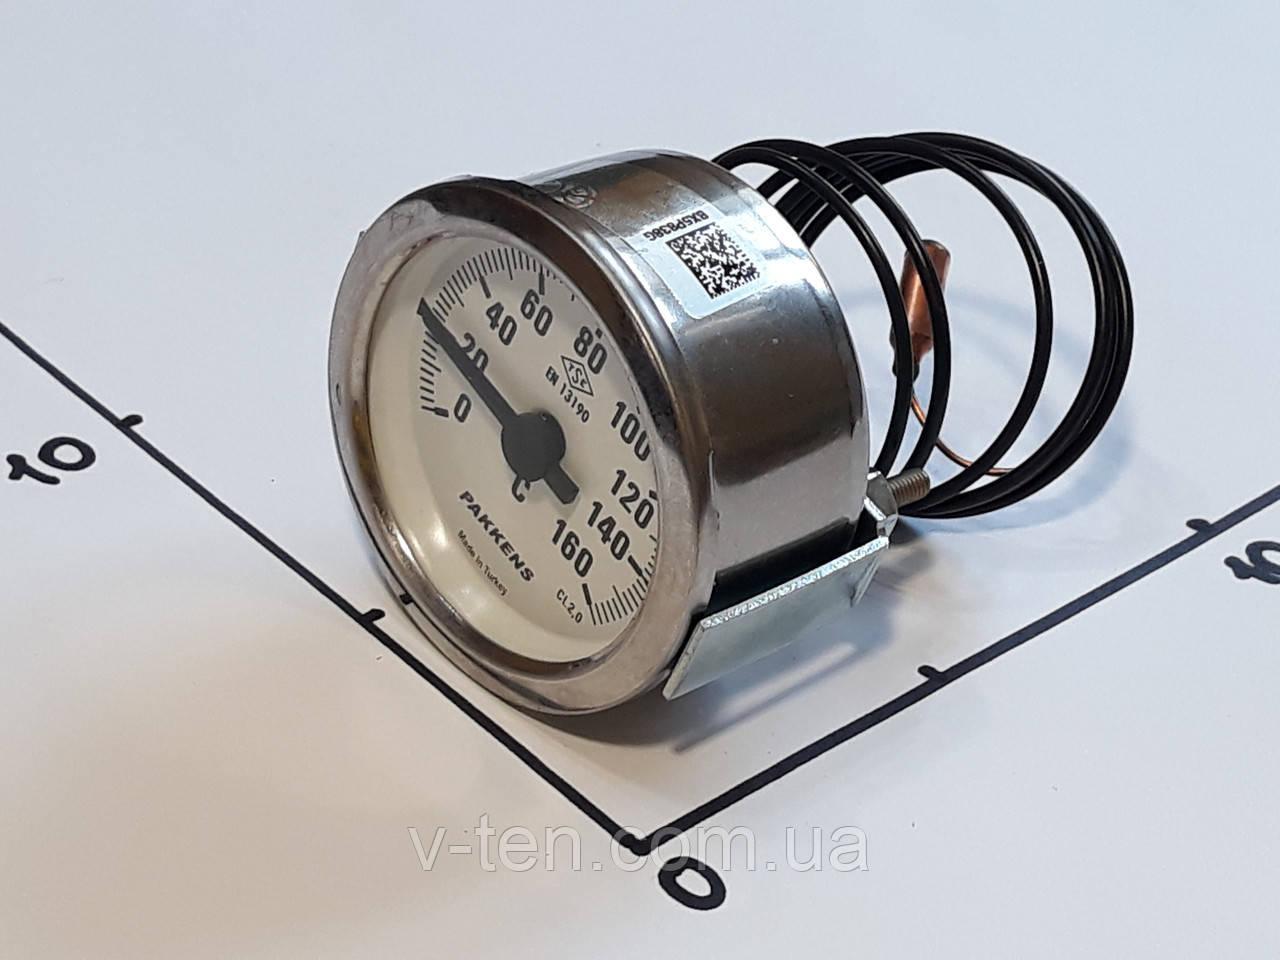 Термометр Ø60мм / 160°С / L-100 cм капиллярный PAKKENS (Турция)